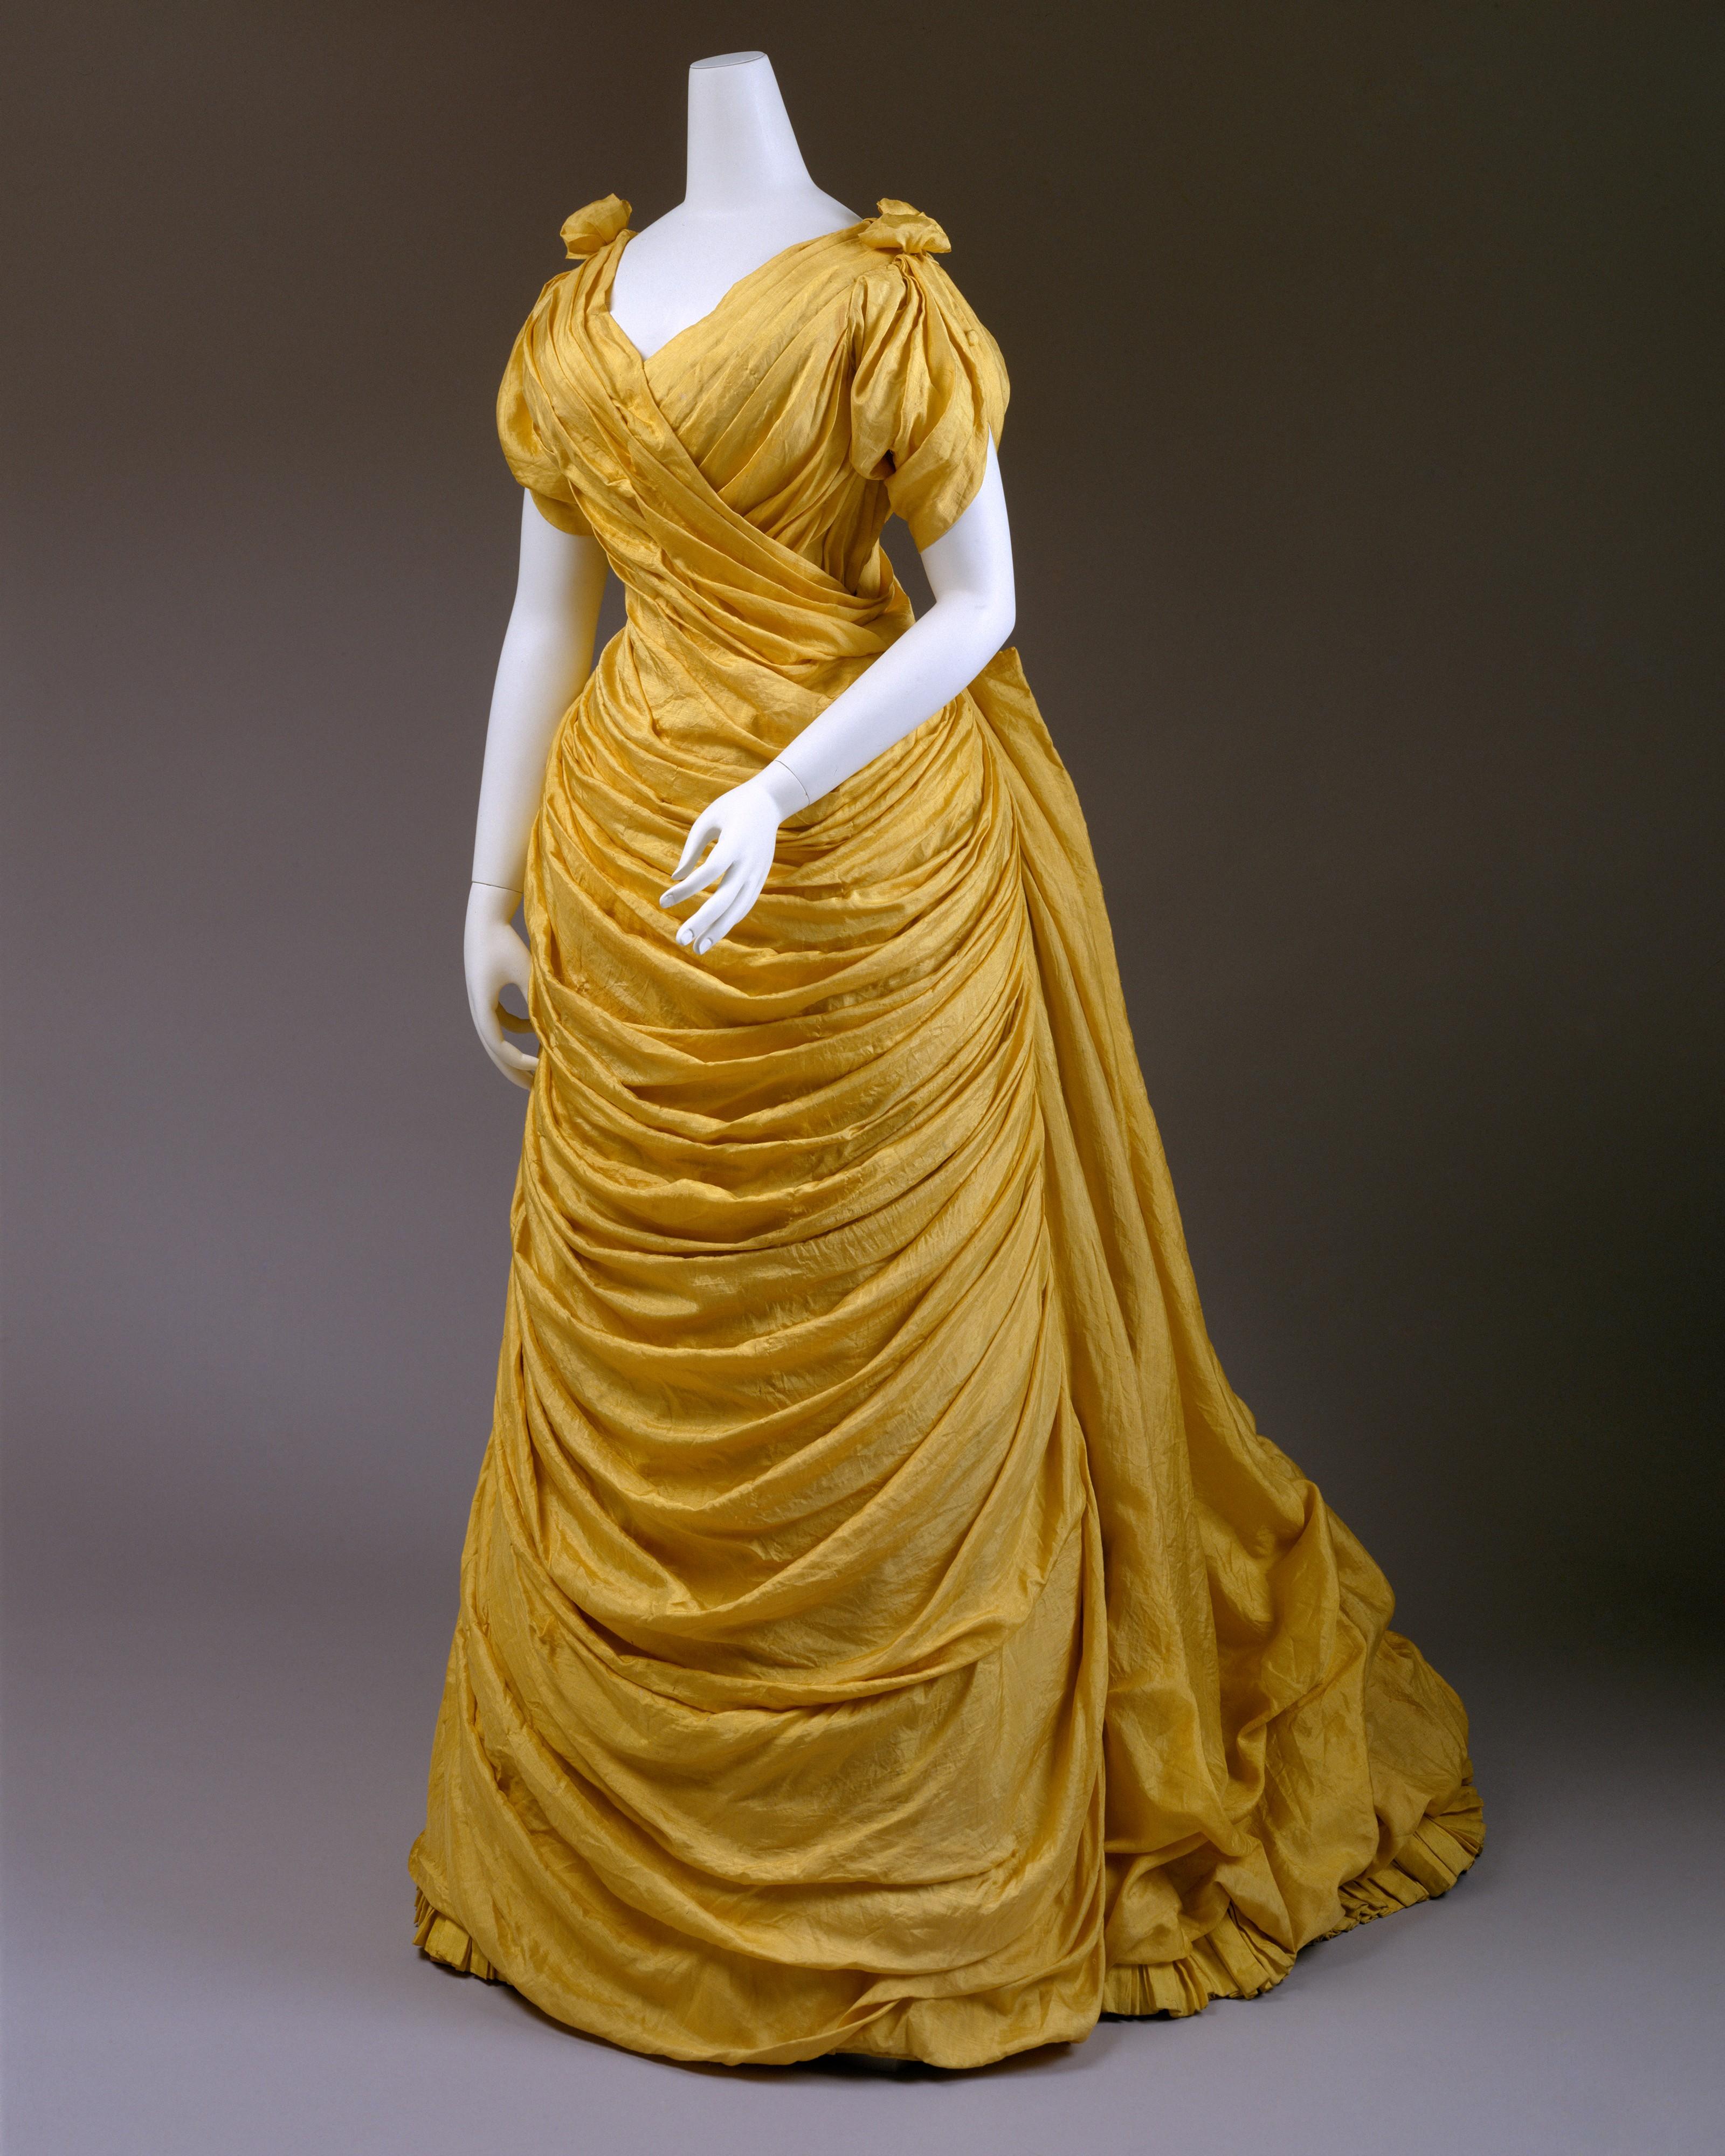 1880s liberty of london yellow silk evening dress 1 via met museum